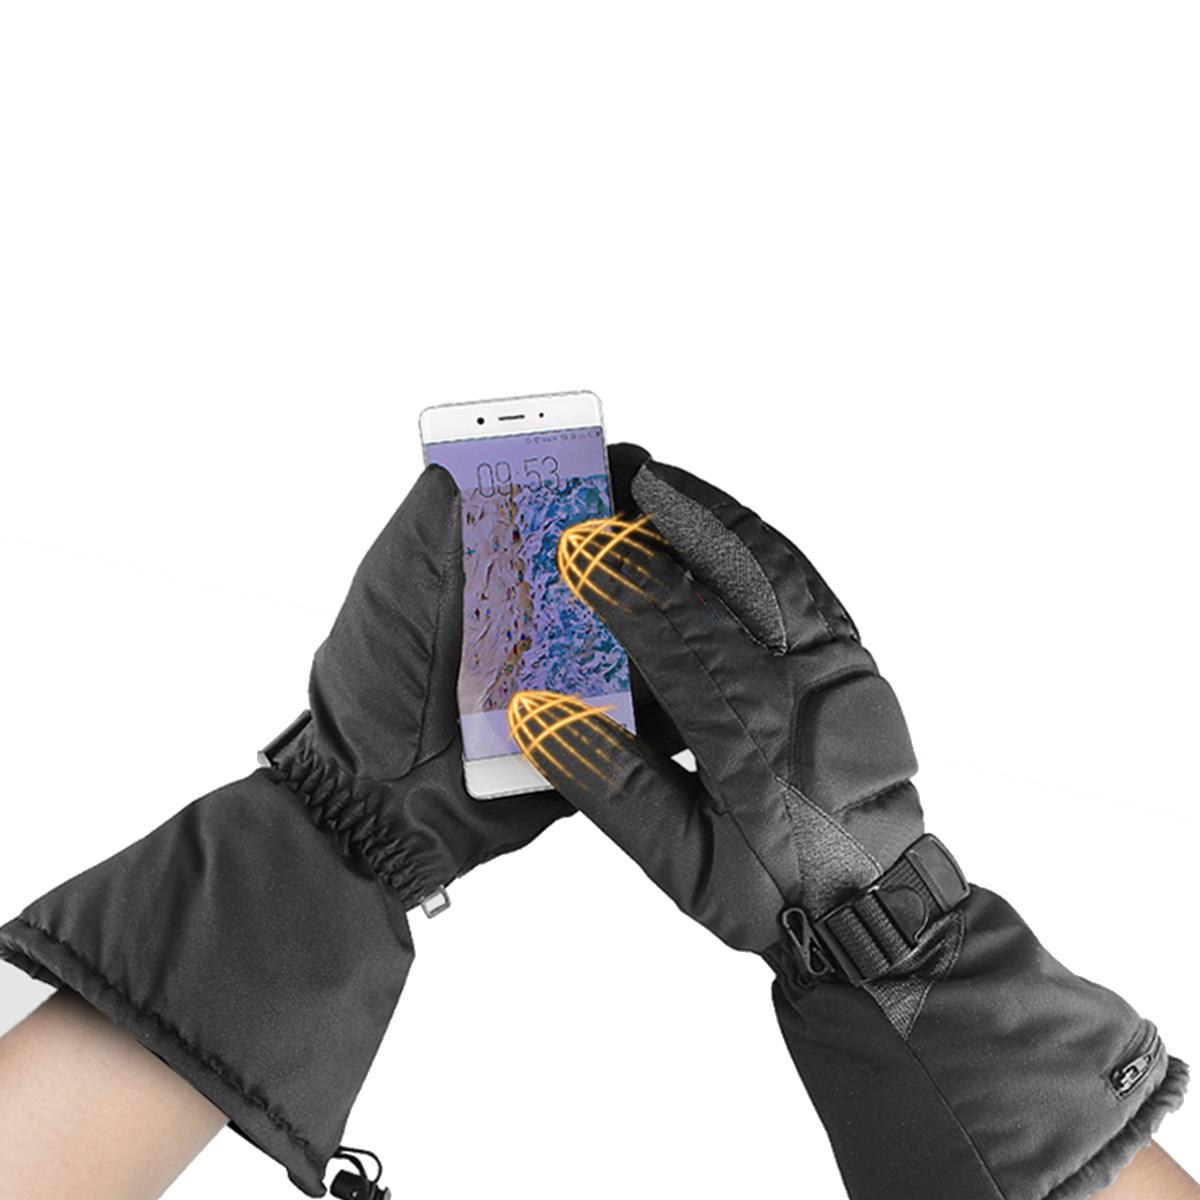 65C Electric Heated Gloves Motorcycle Warmer Outdoor Skiing Winter Warm Heating Waterproof